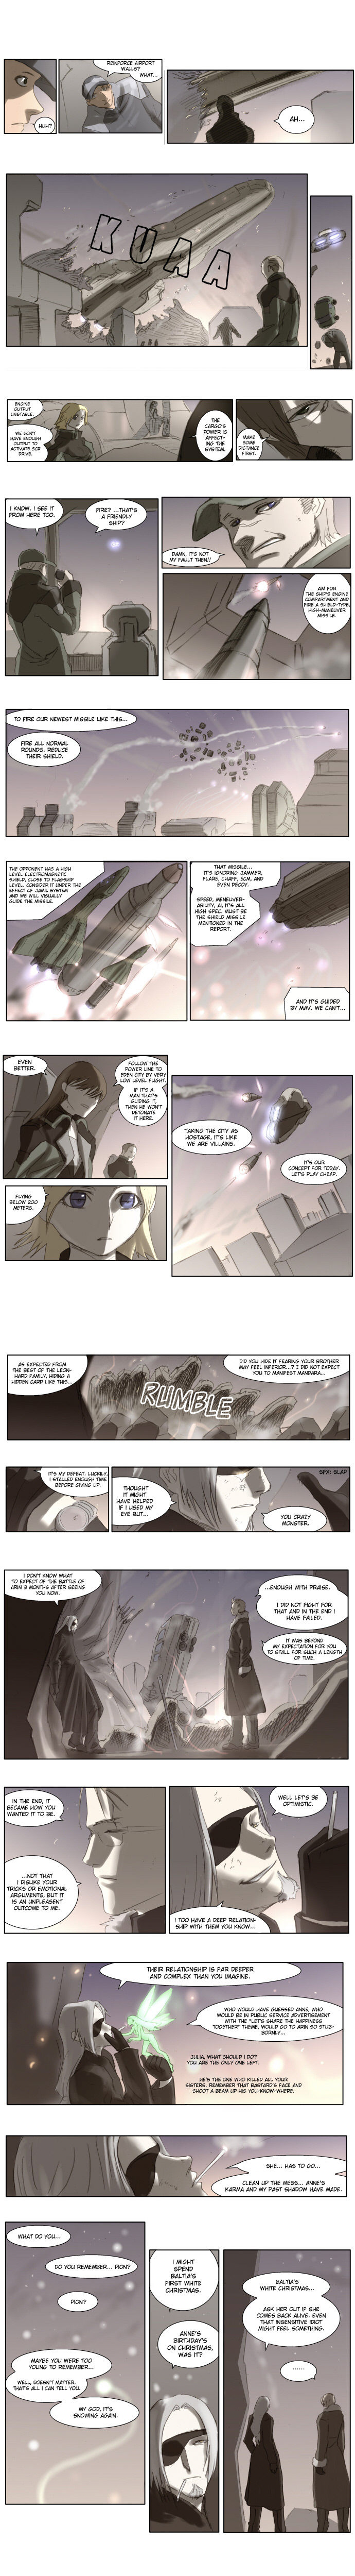 Knight Run 36 Page 1